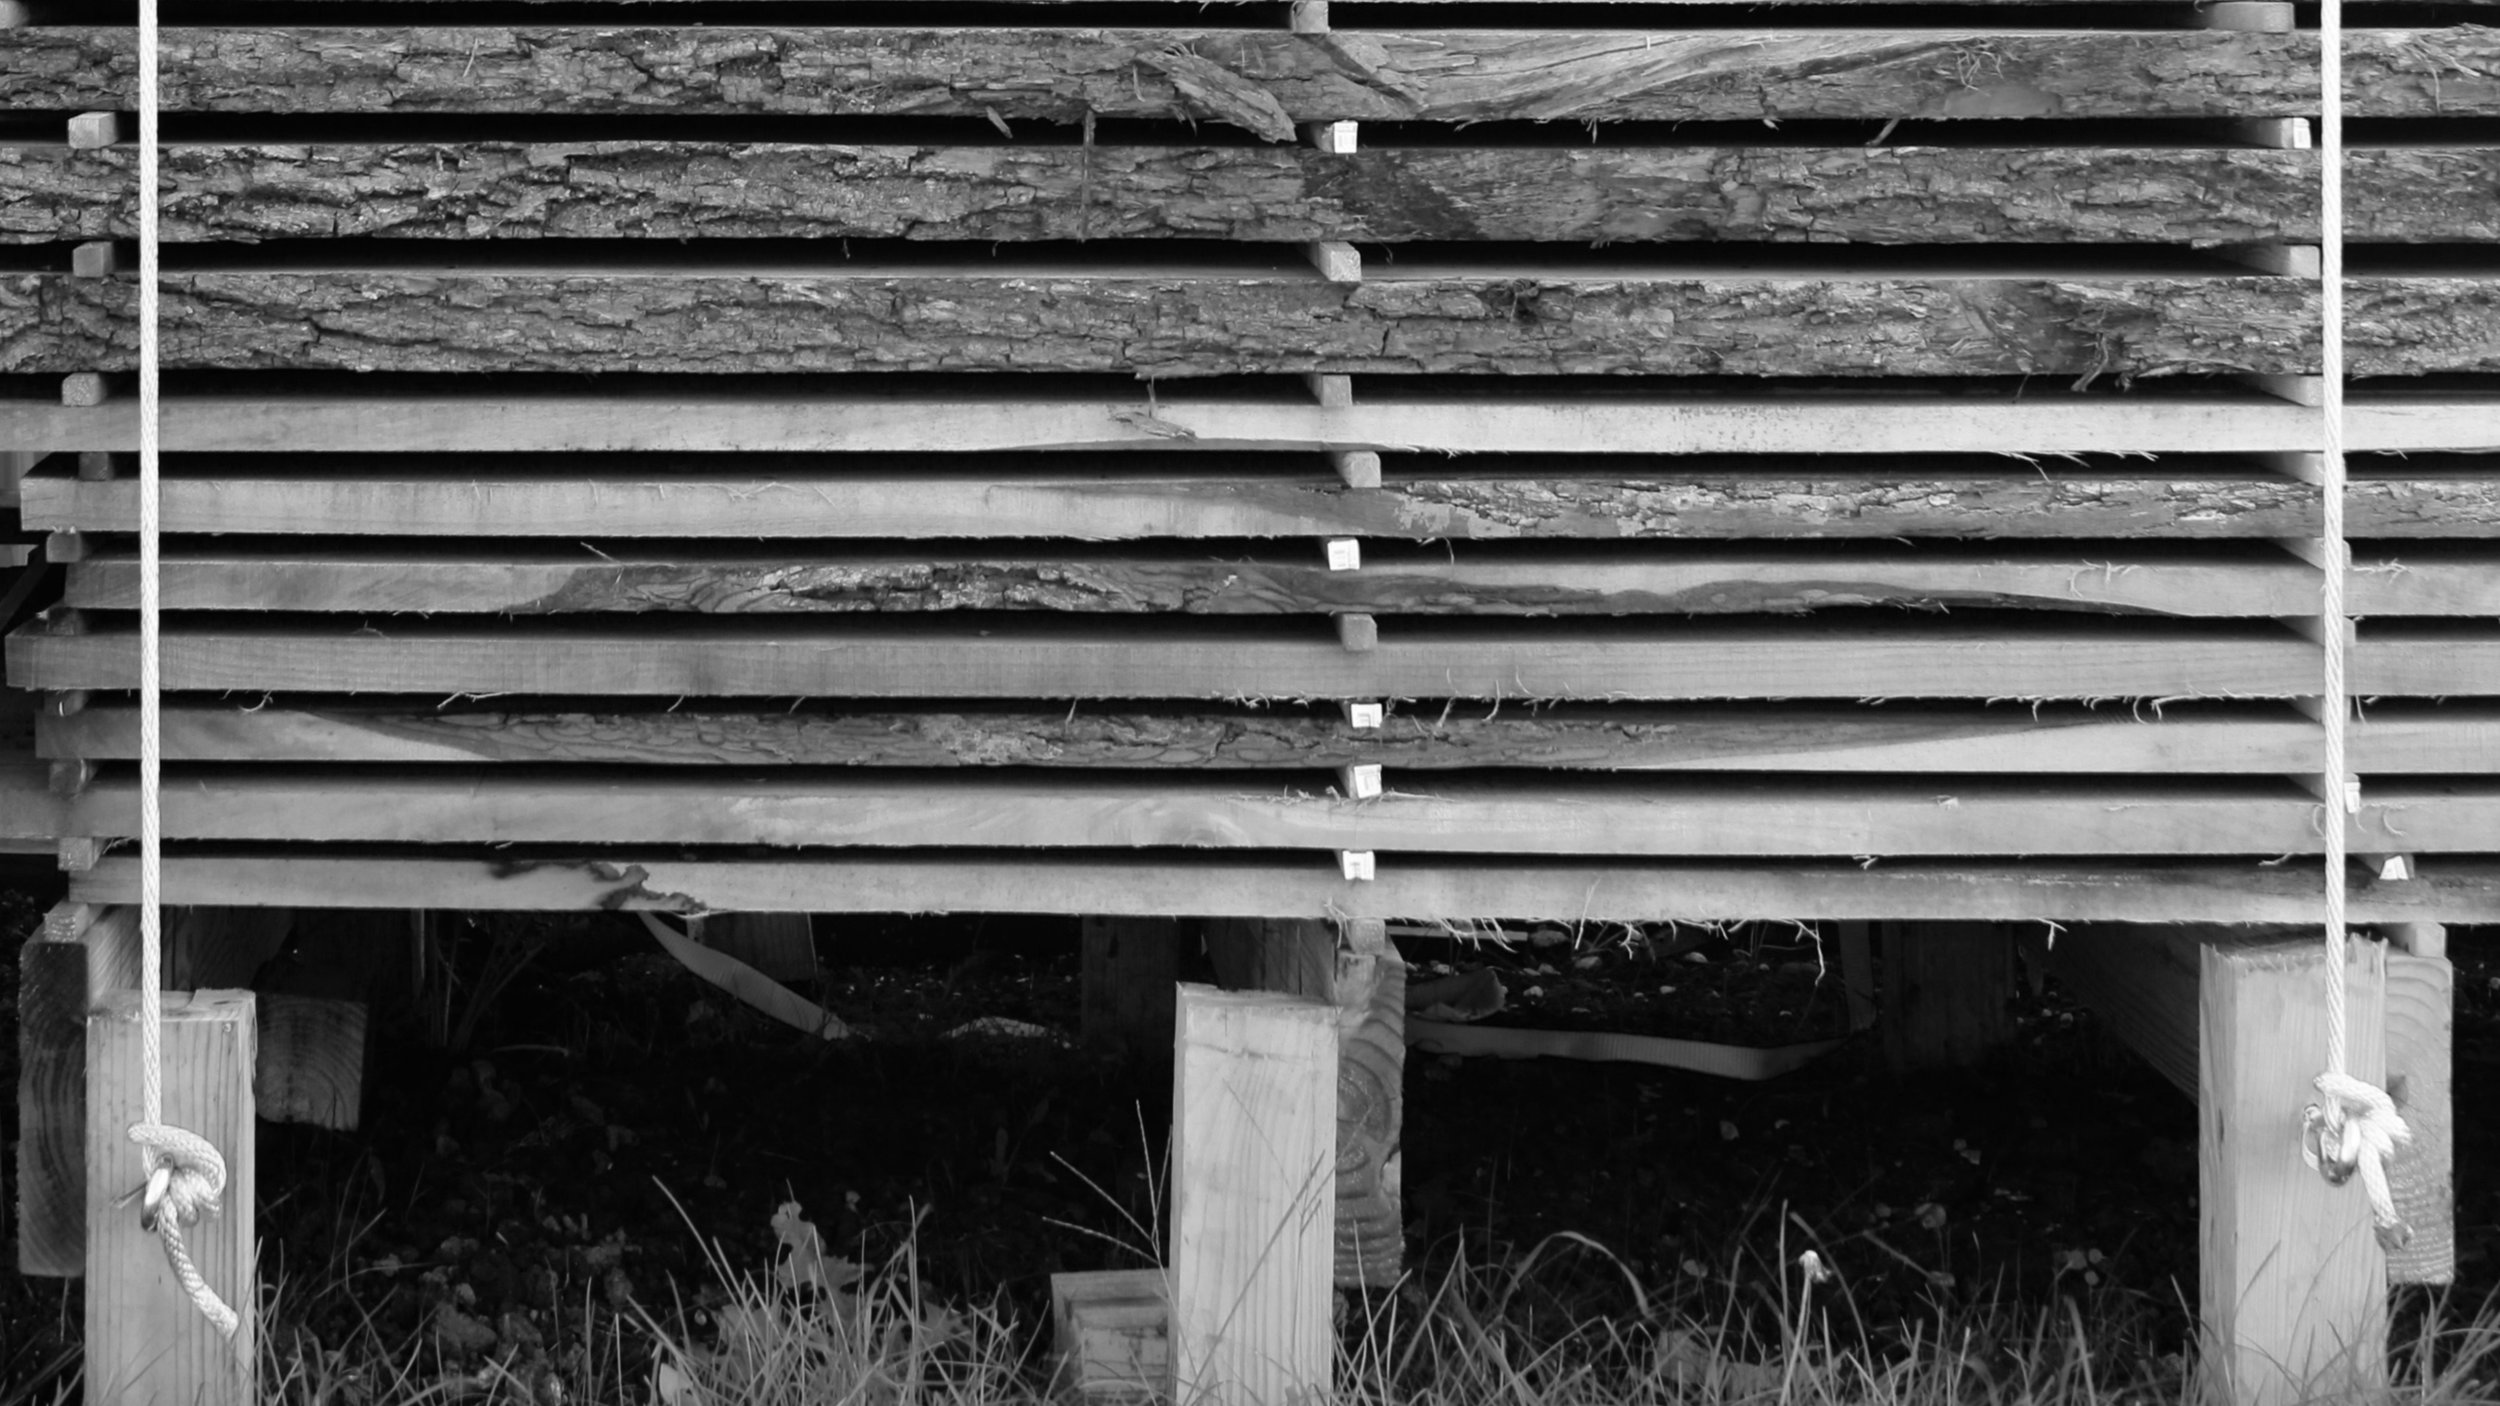 Lumber Selection_16x9.jpg